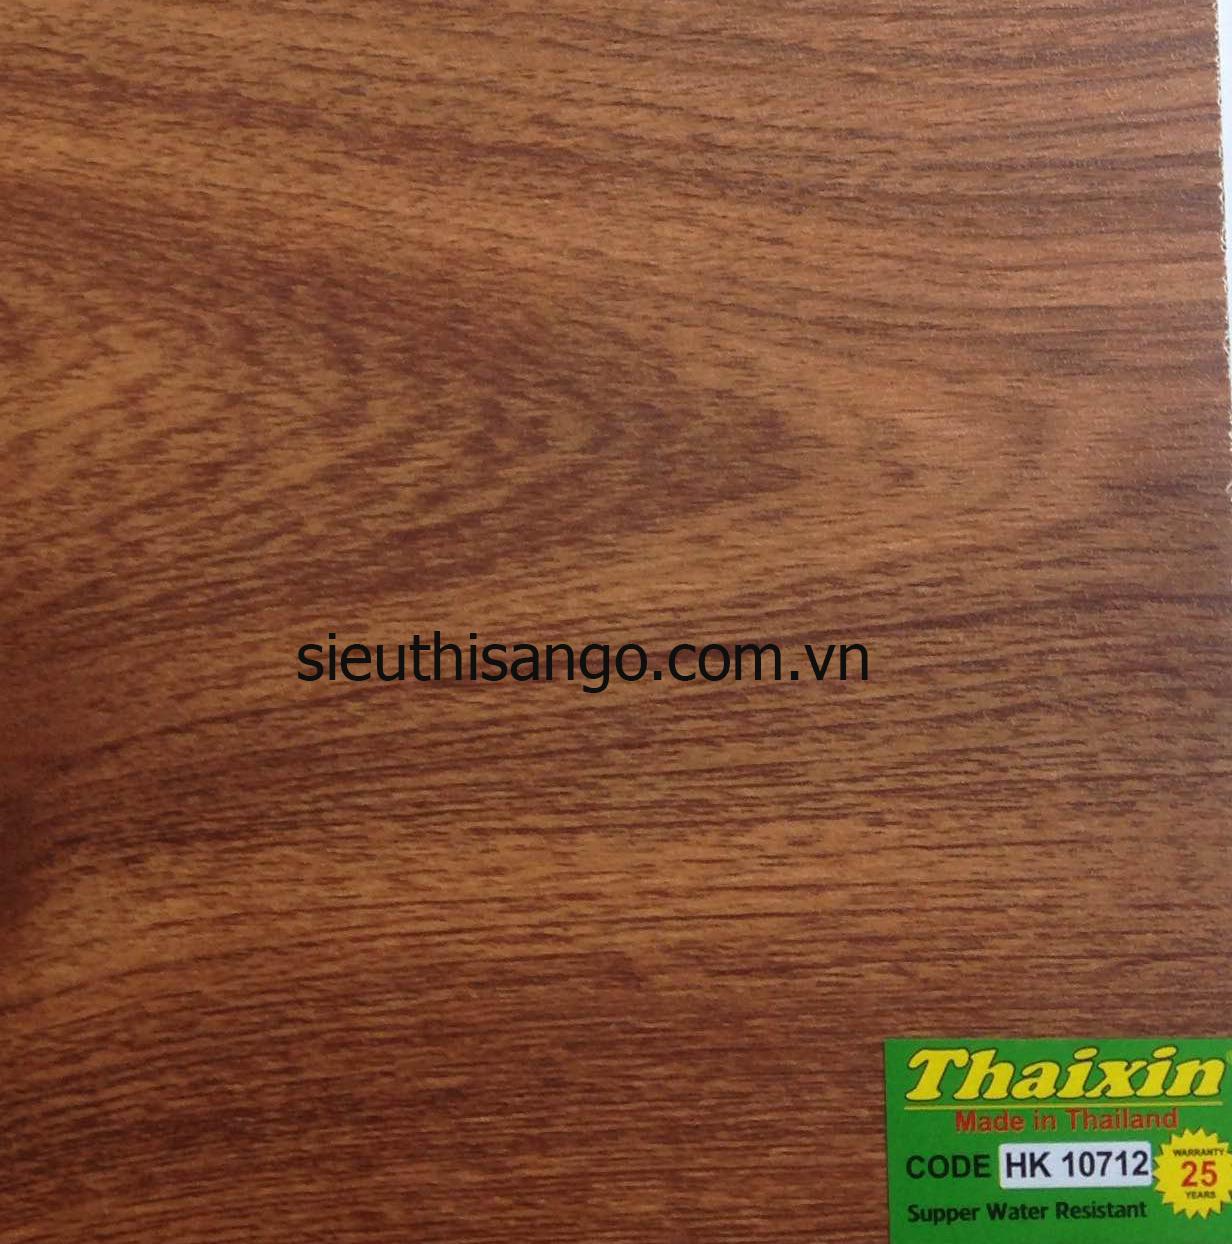 Sàn Gỗ Thaixin 12mm HK10712